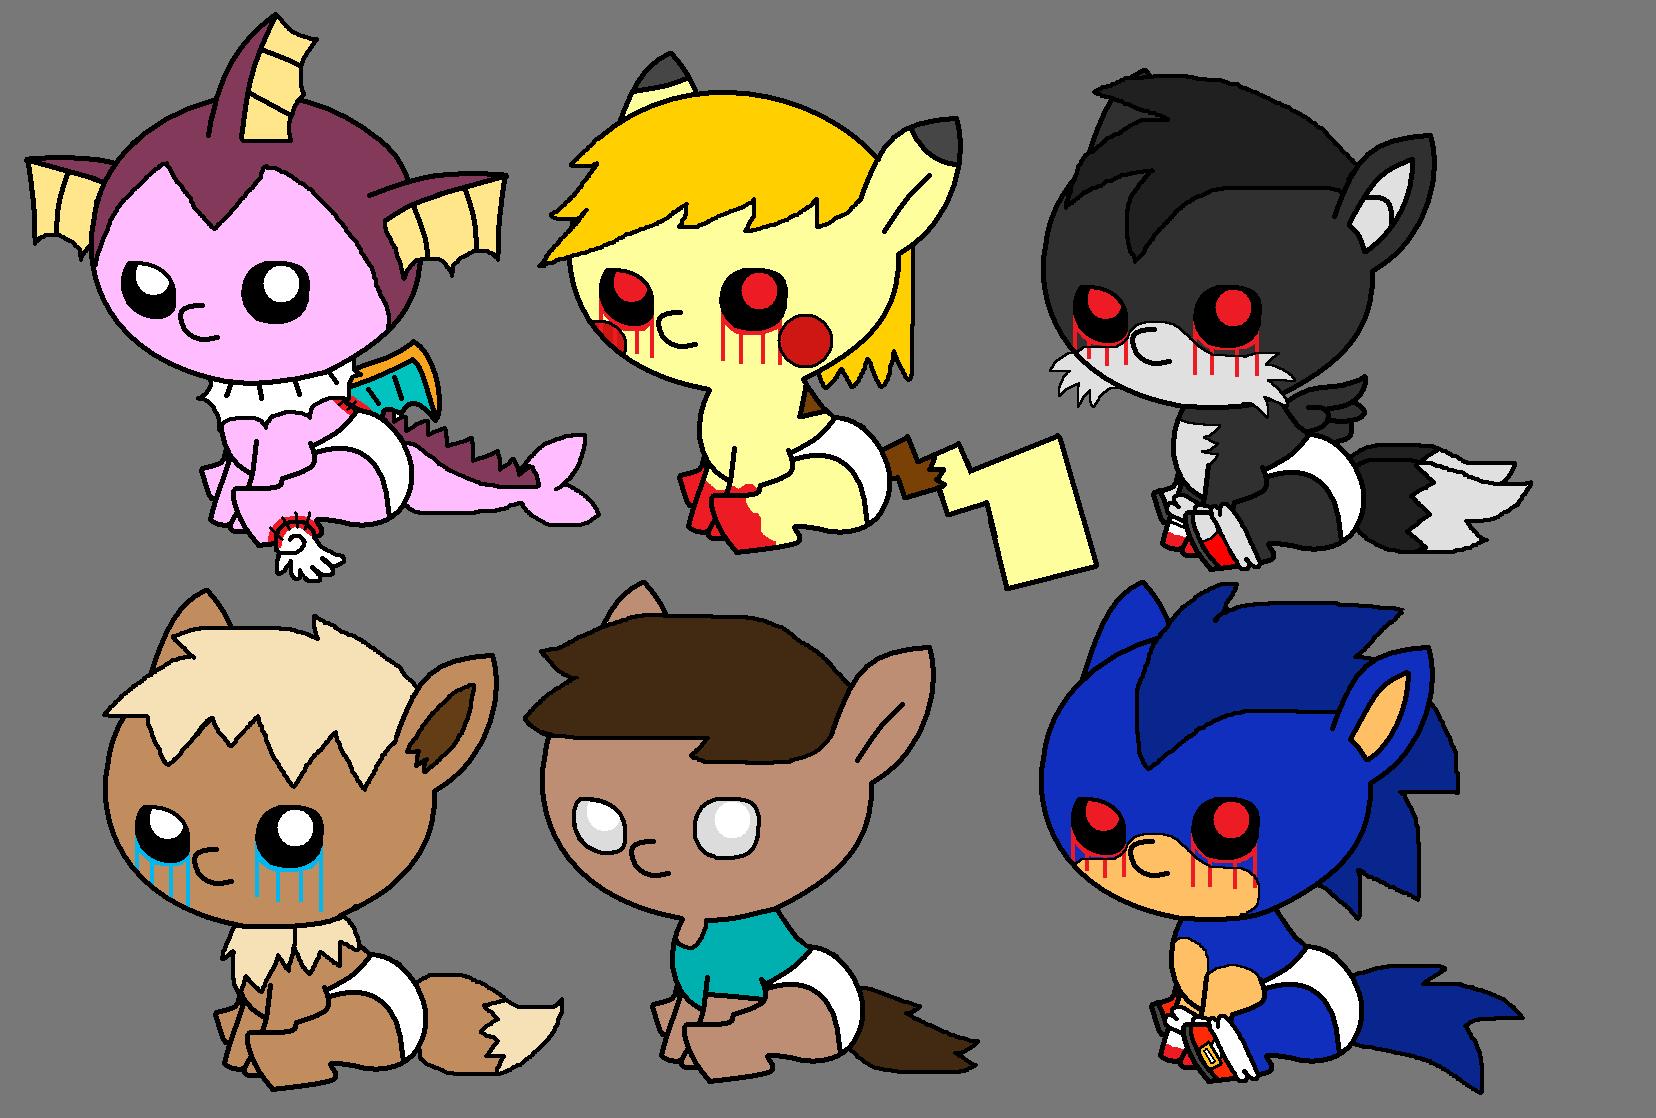 Creepypasta pony point adoptables set 2 by pokemonlpsfan on deviantart